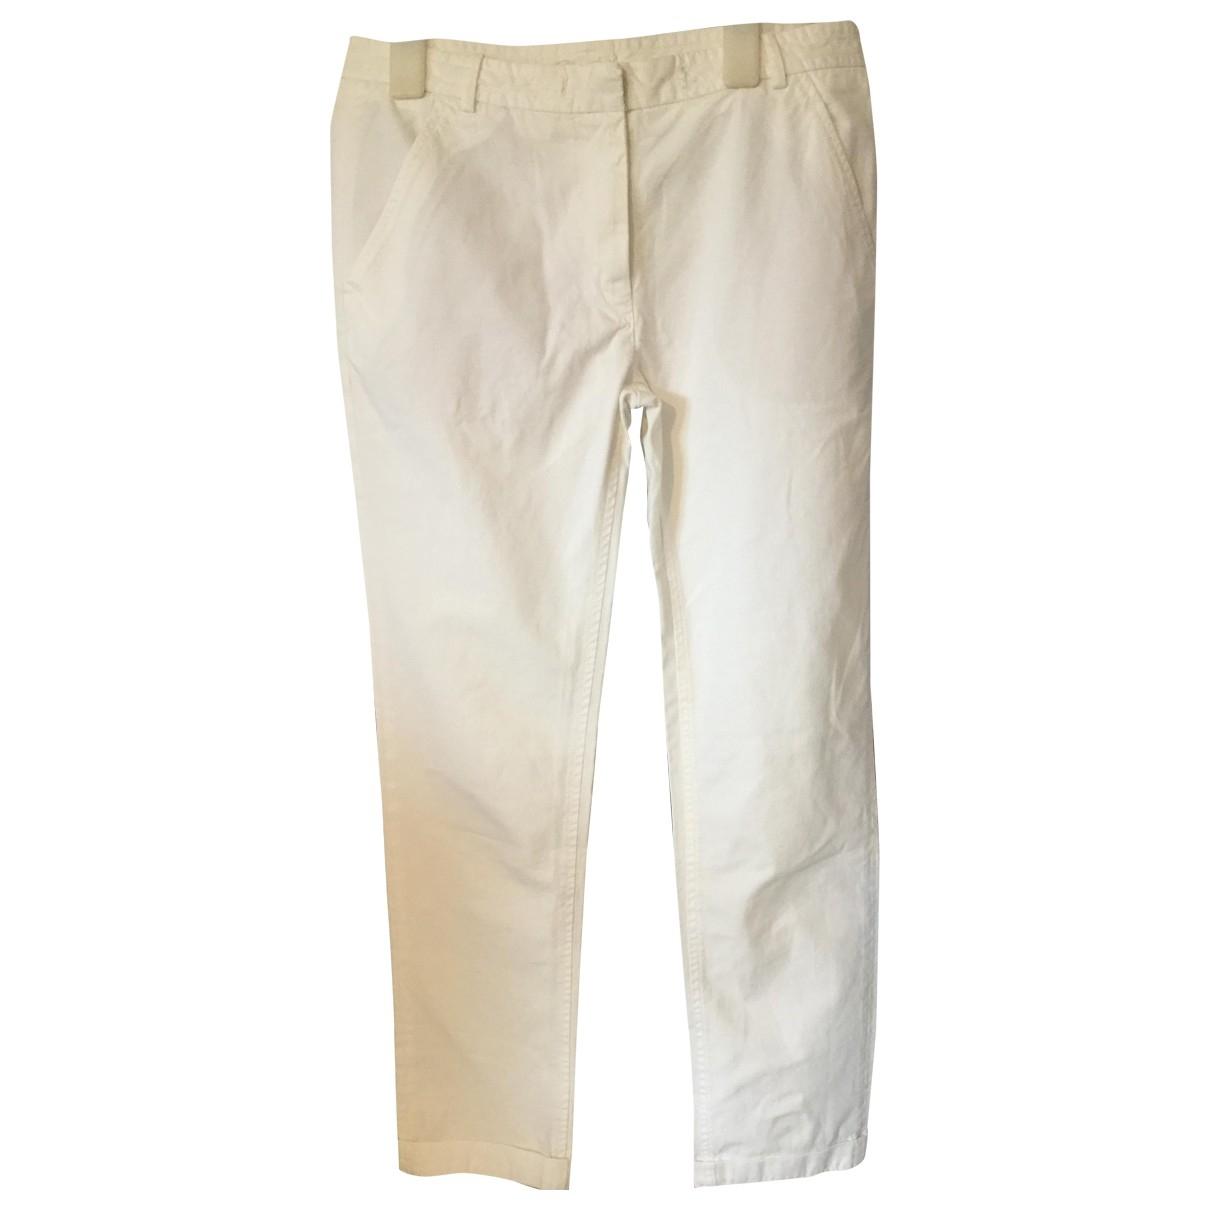 Isabel Marant Etoile \N White Cotton Trousers for Women 1 0-5